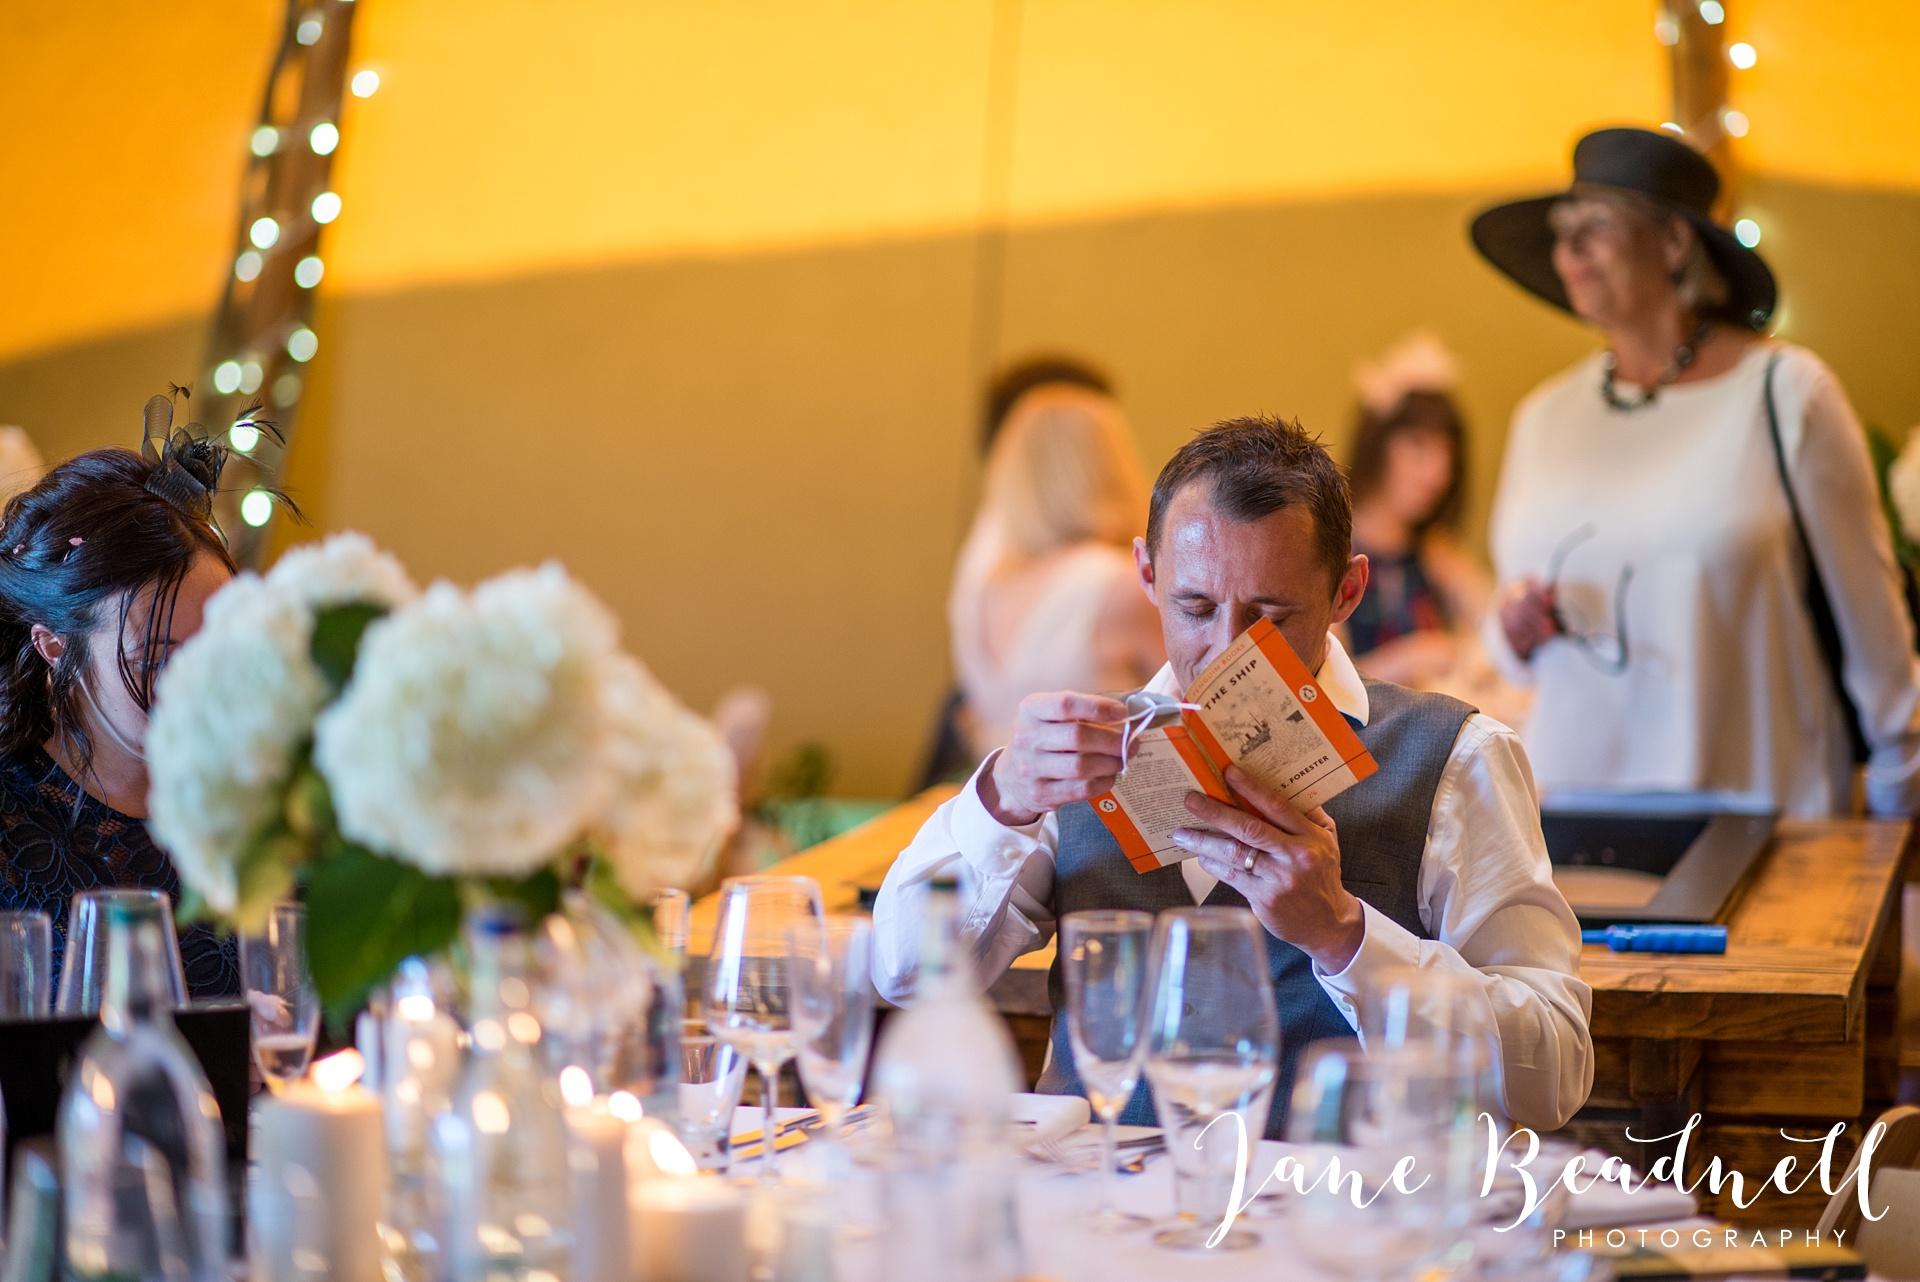 fine-art-wedding-photographer-jane-beadnell-yorkshire-wedding-photographer_0119